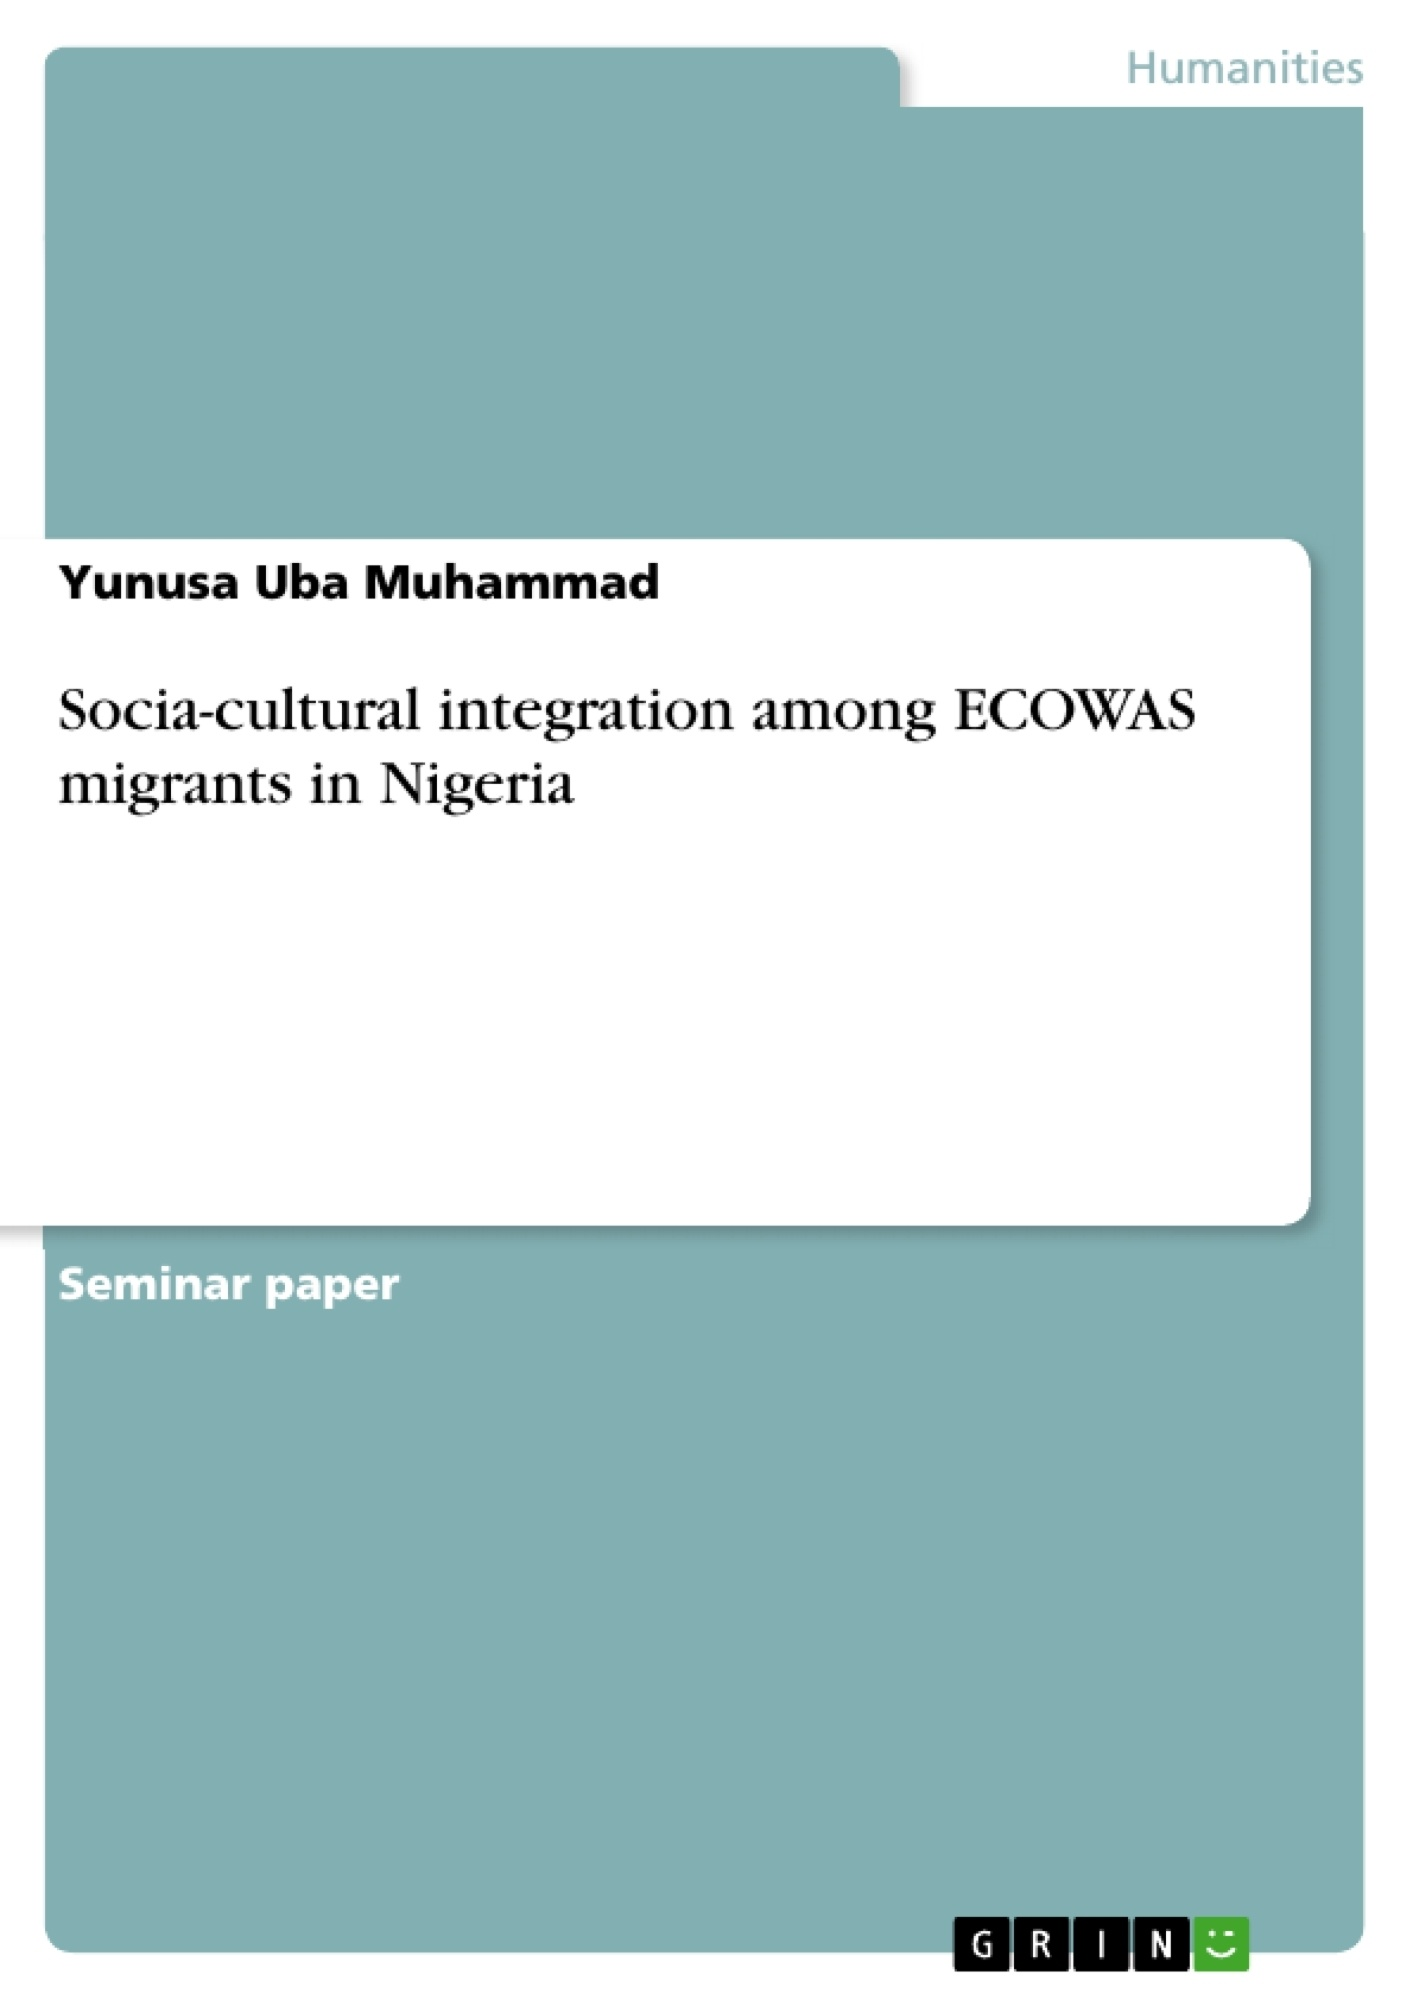 Title: Socia-cultural integration among ECOWAS migrants in Nigeria